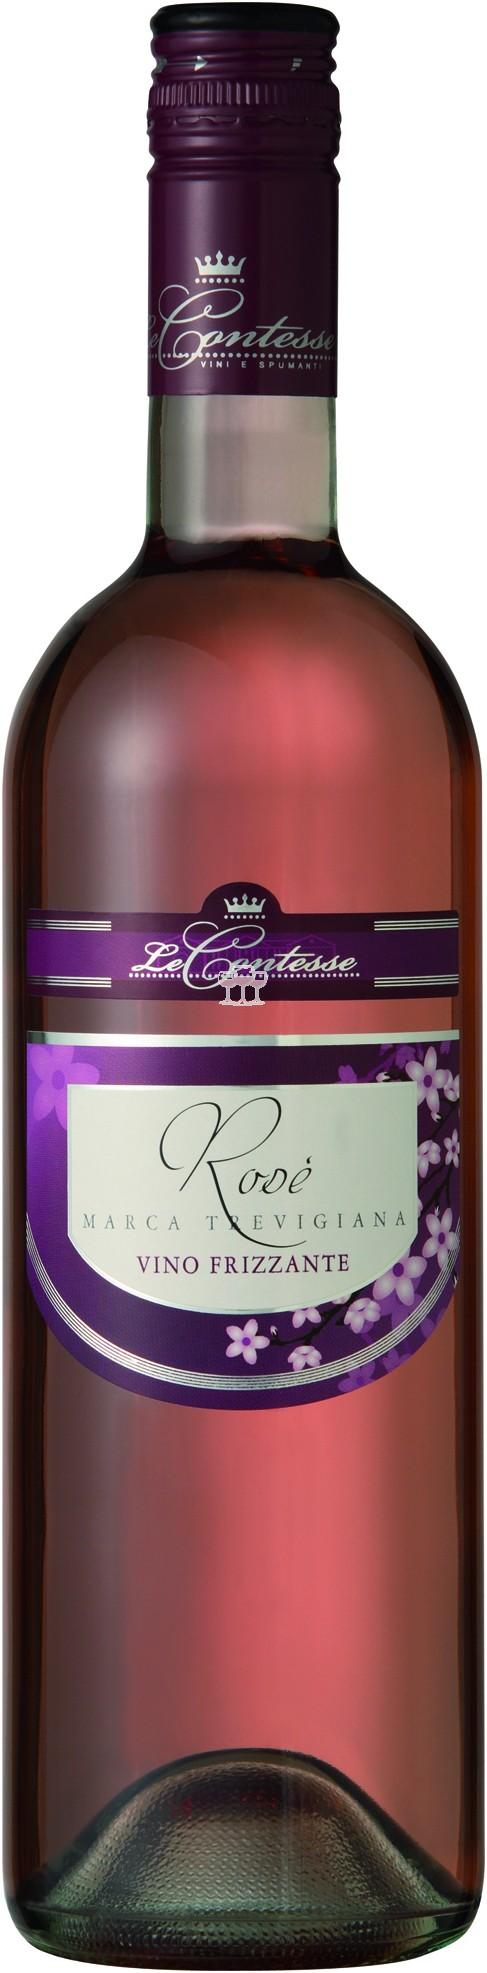 Pinot Rosè Frizzante IGT Marca Trevigiana Italien trocken